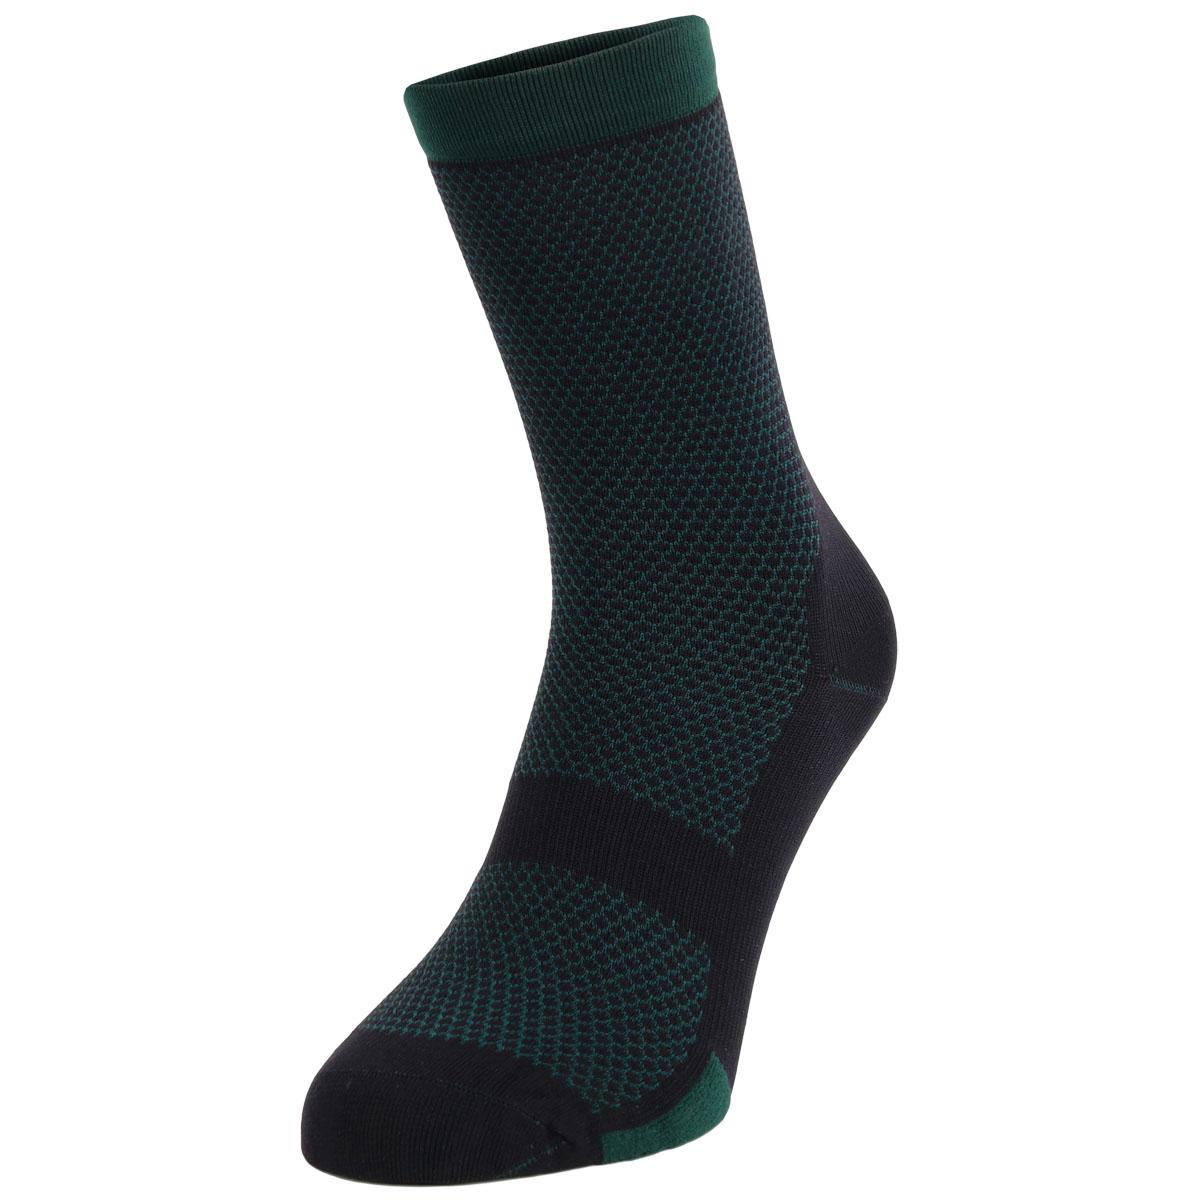 Isadore Climber's Socken - Madeleine